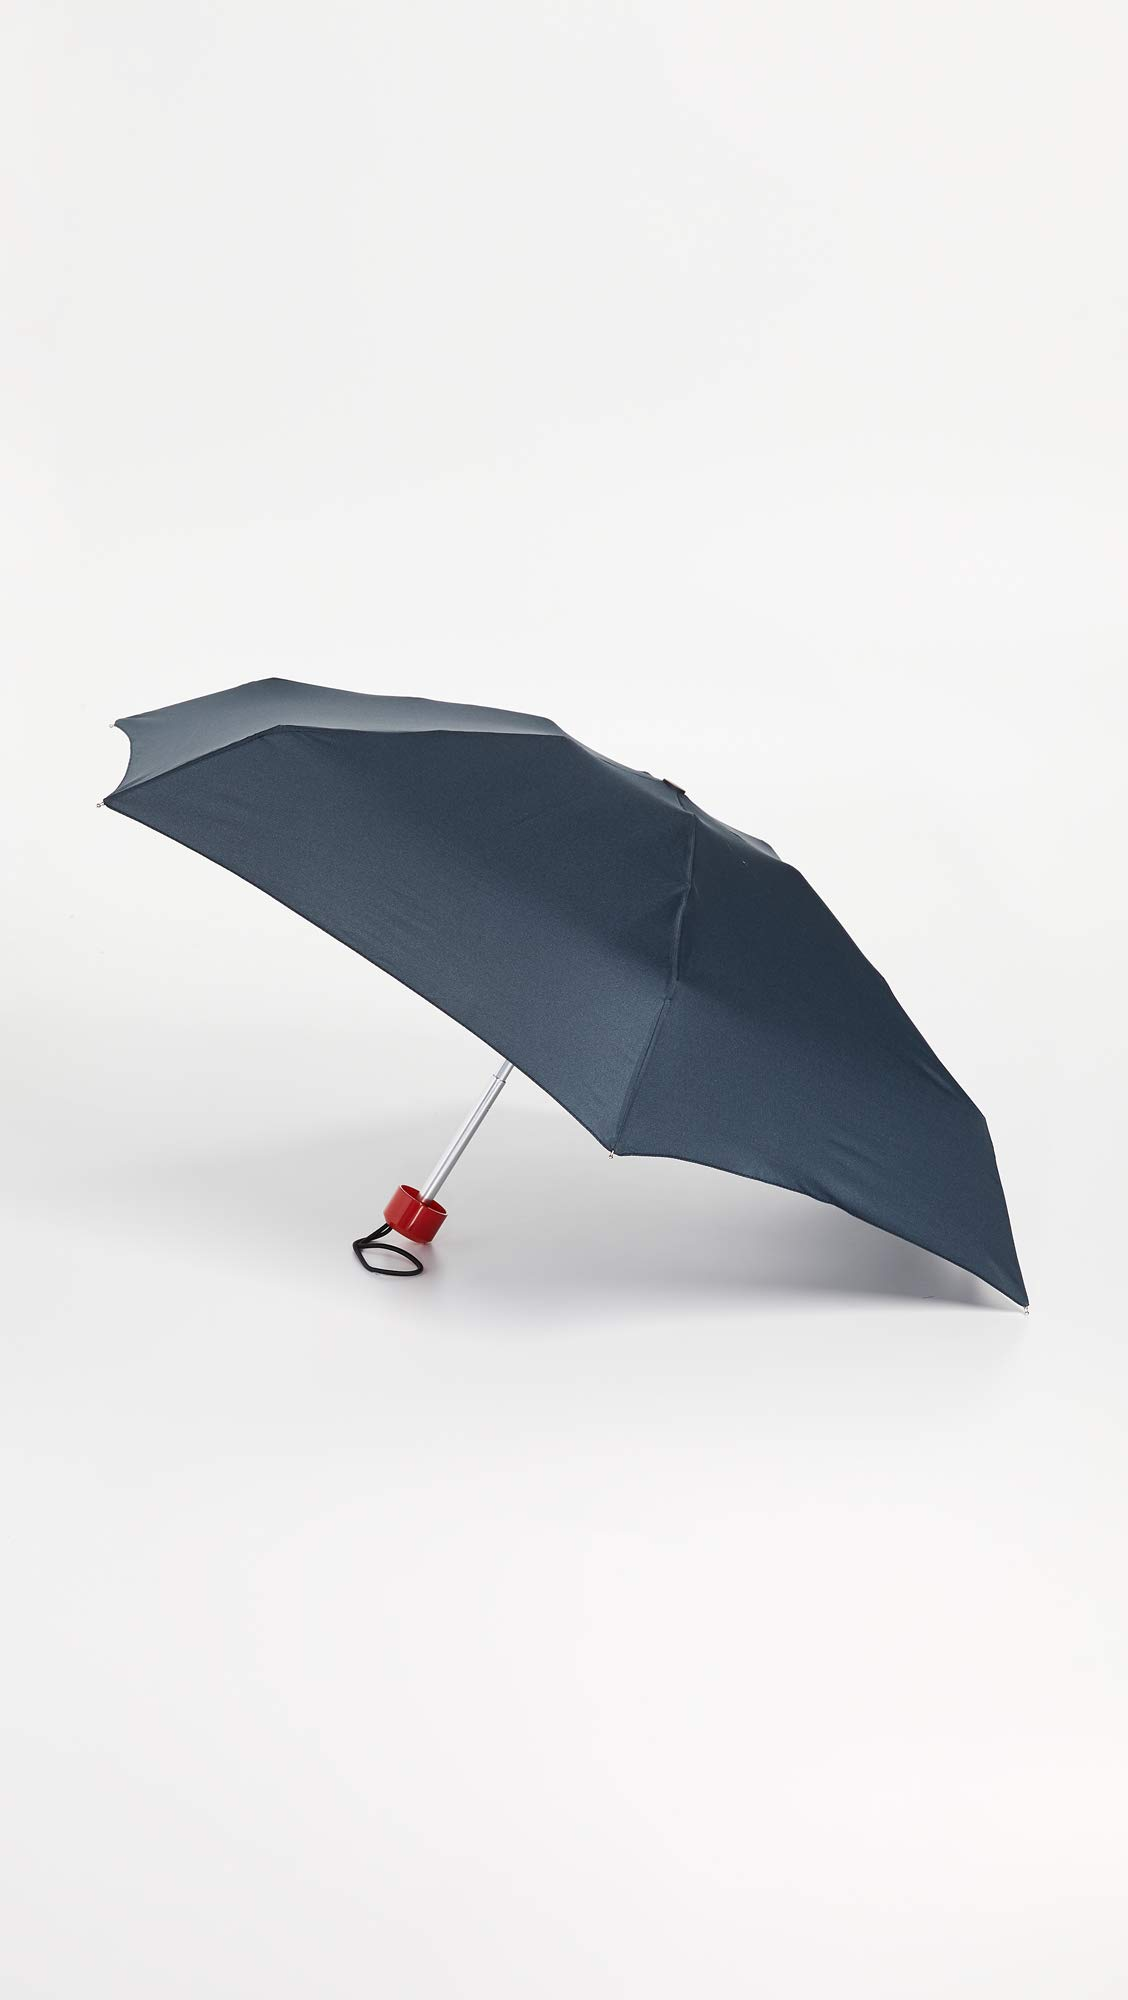 Hunter Boots Men's Original Mini Compact Umbrella, Navy, Blue, One Size by Hunters (Image #2)